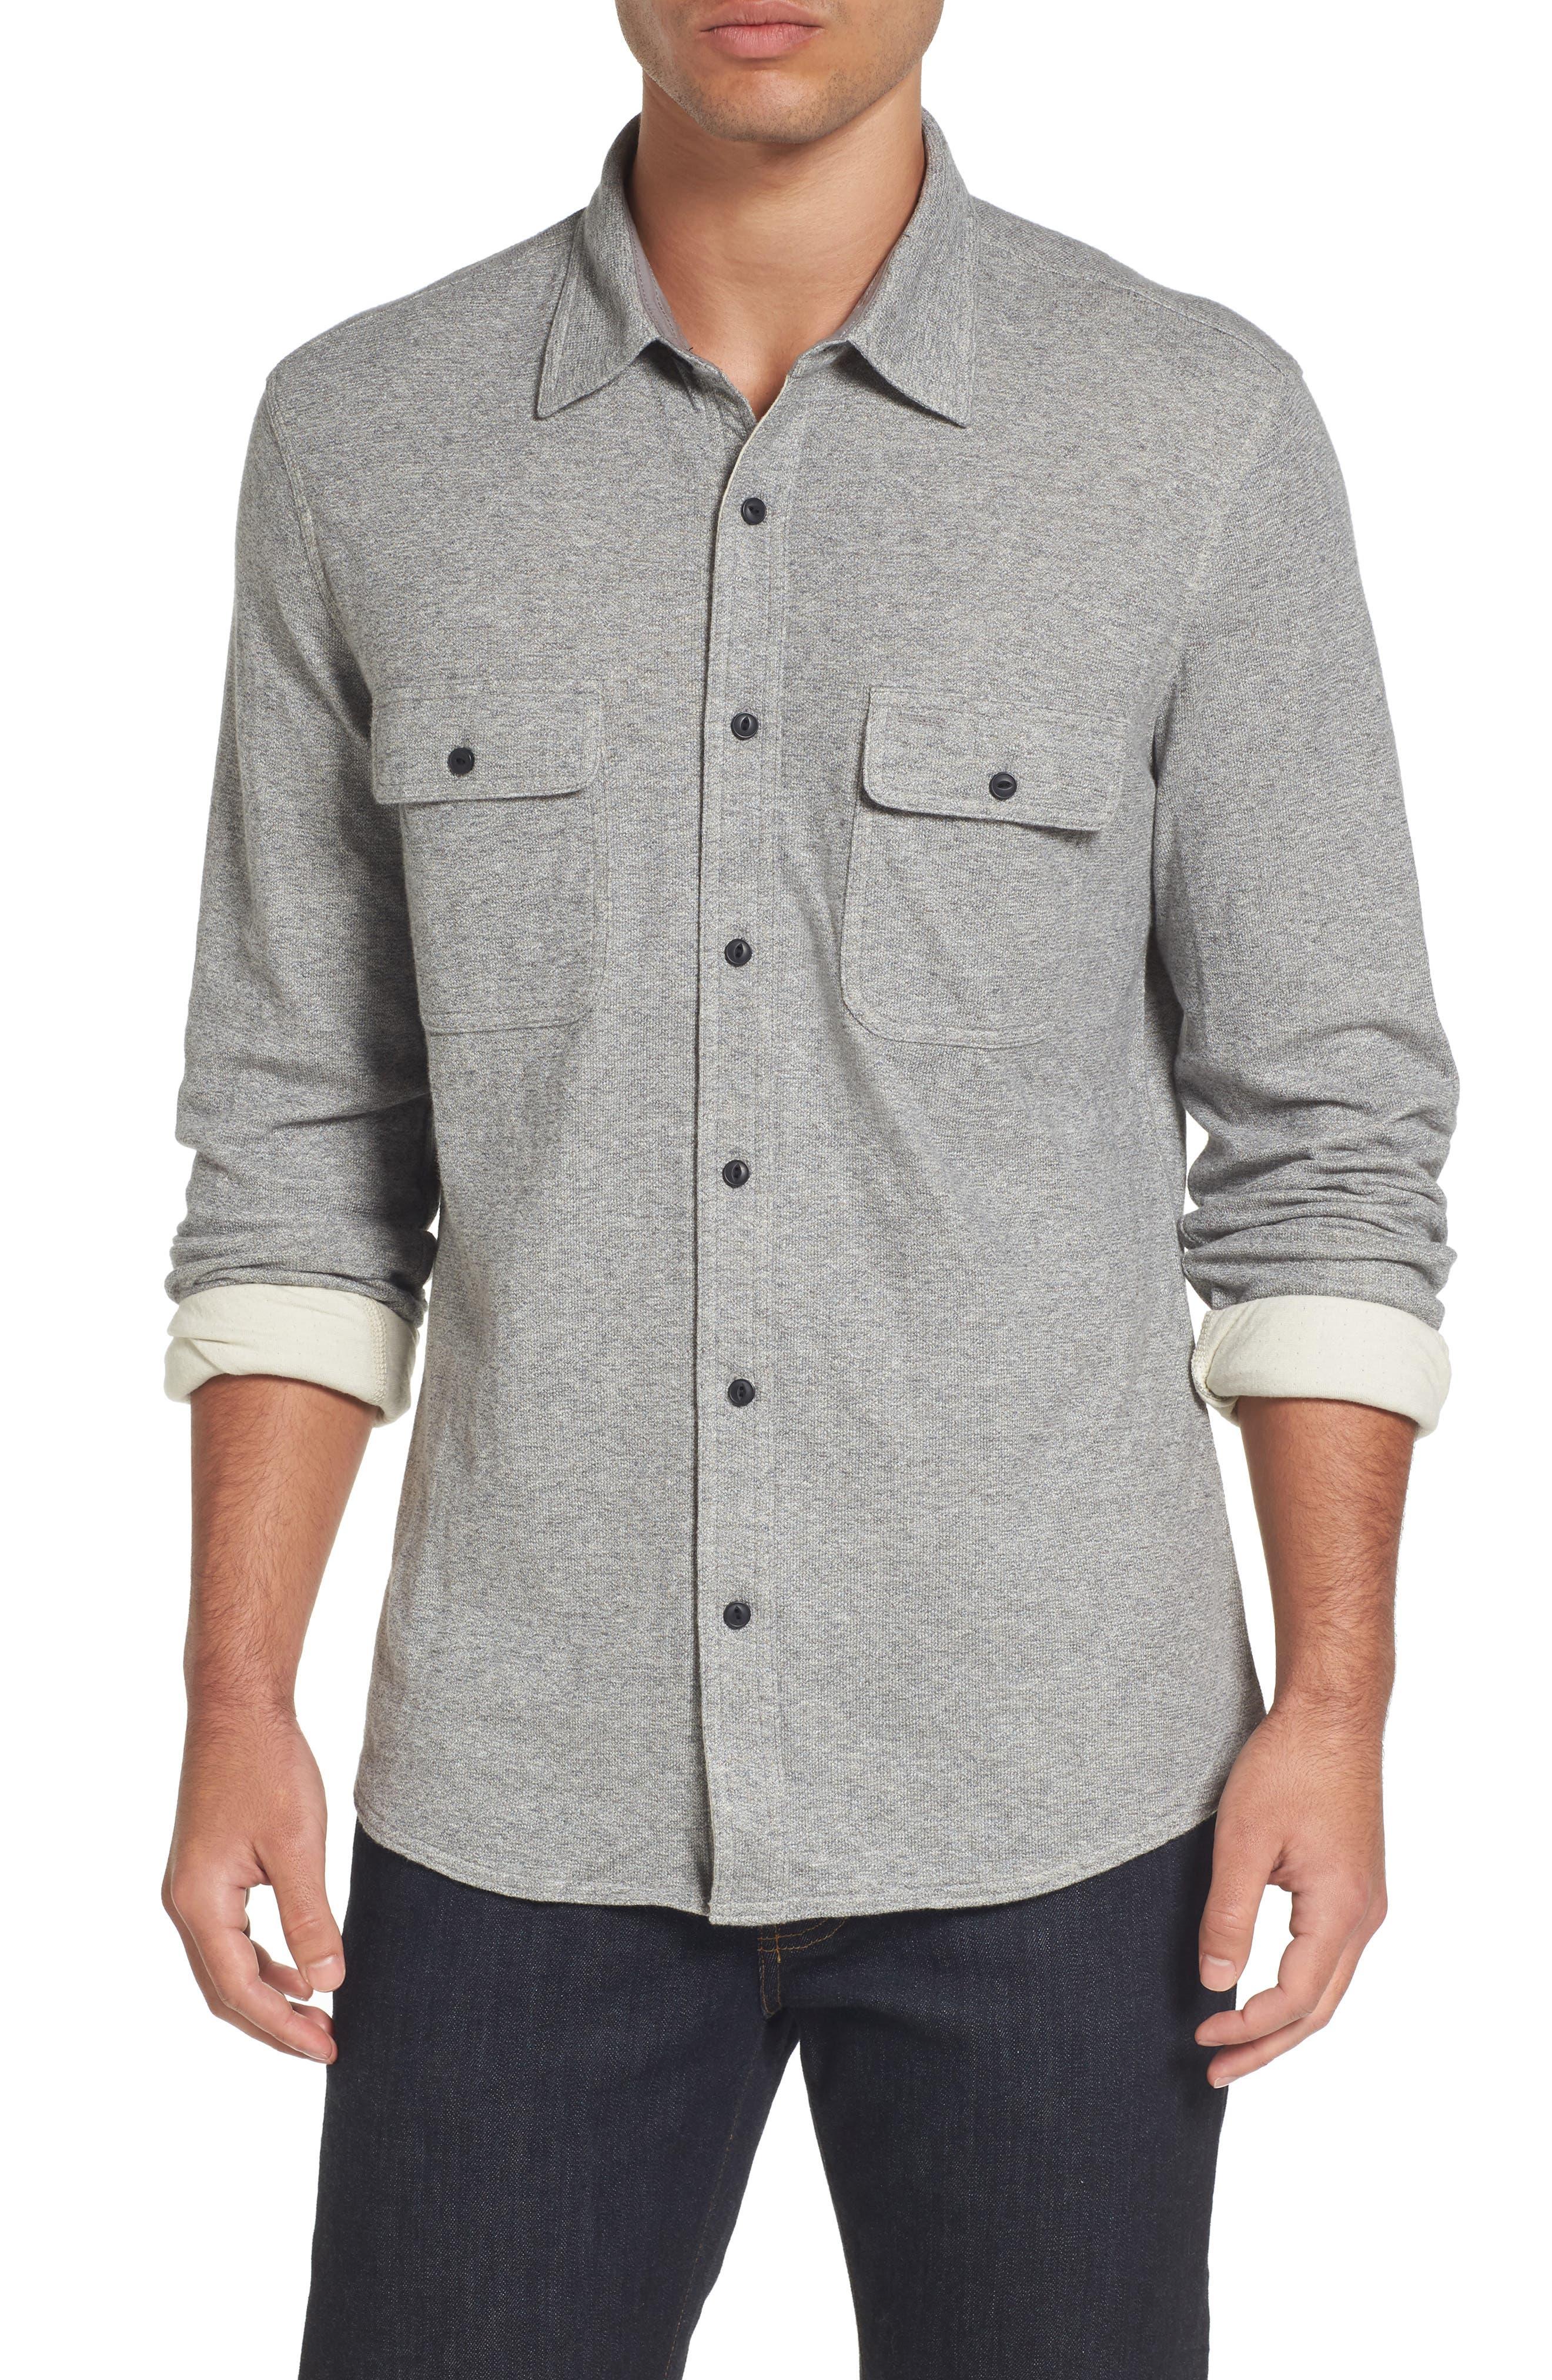 Alternate Image 1 Selected - Nordstrom Men's Shop Trim Fit Knit Sport Shirt (Tall)